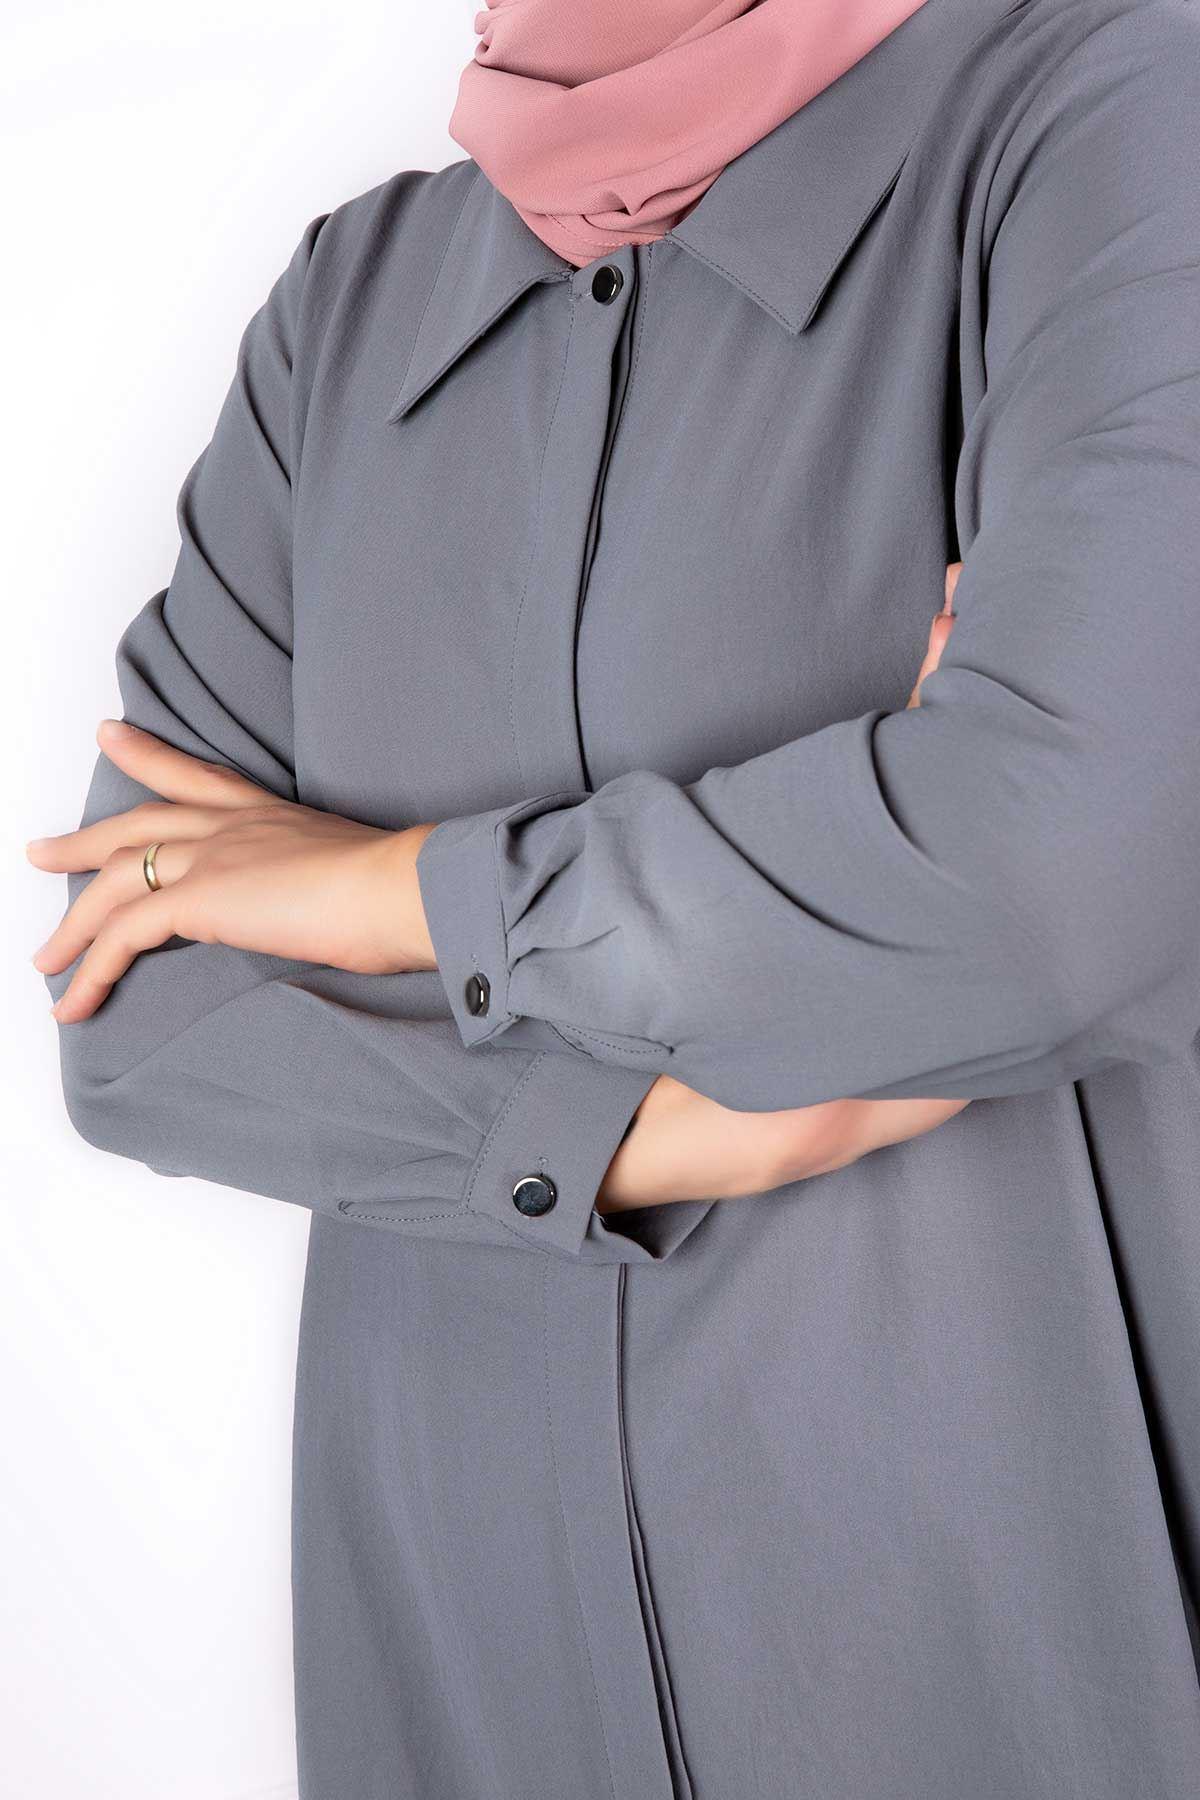 Tuana Pantolonlu Takım Gri 38005